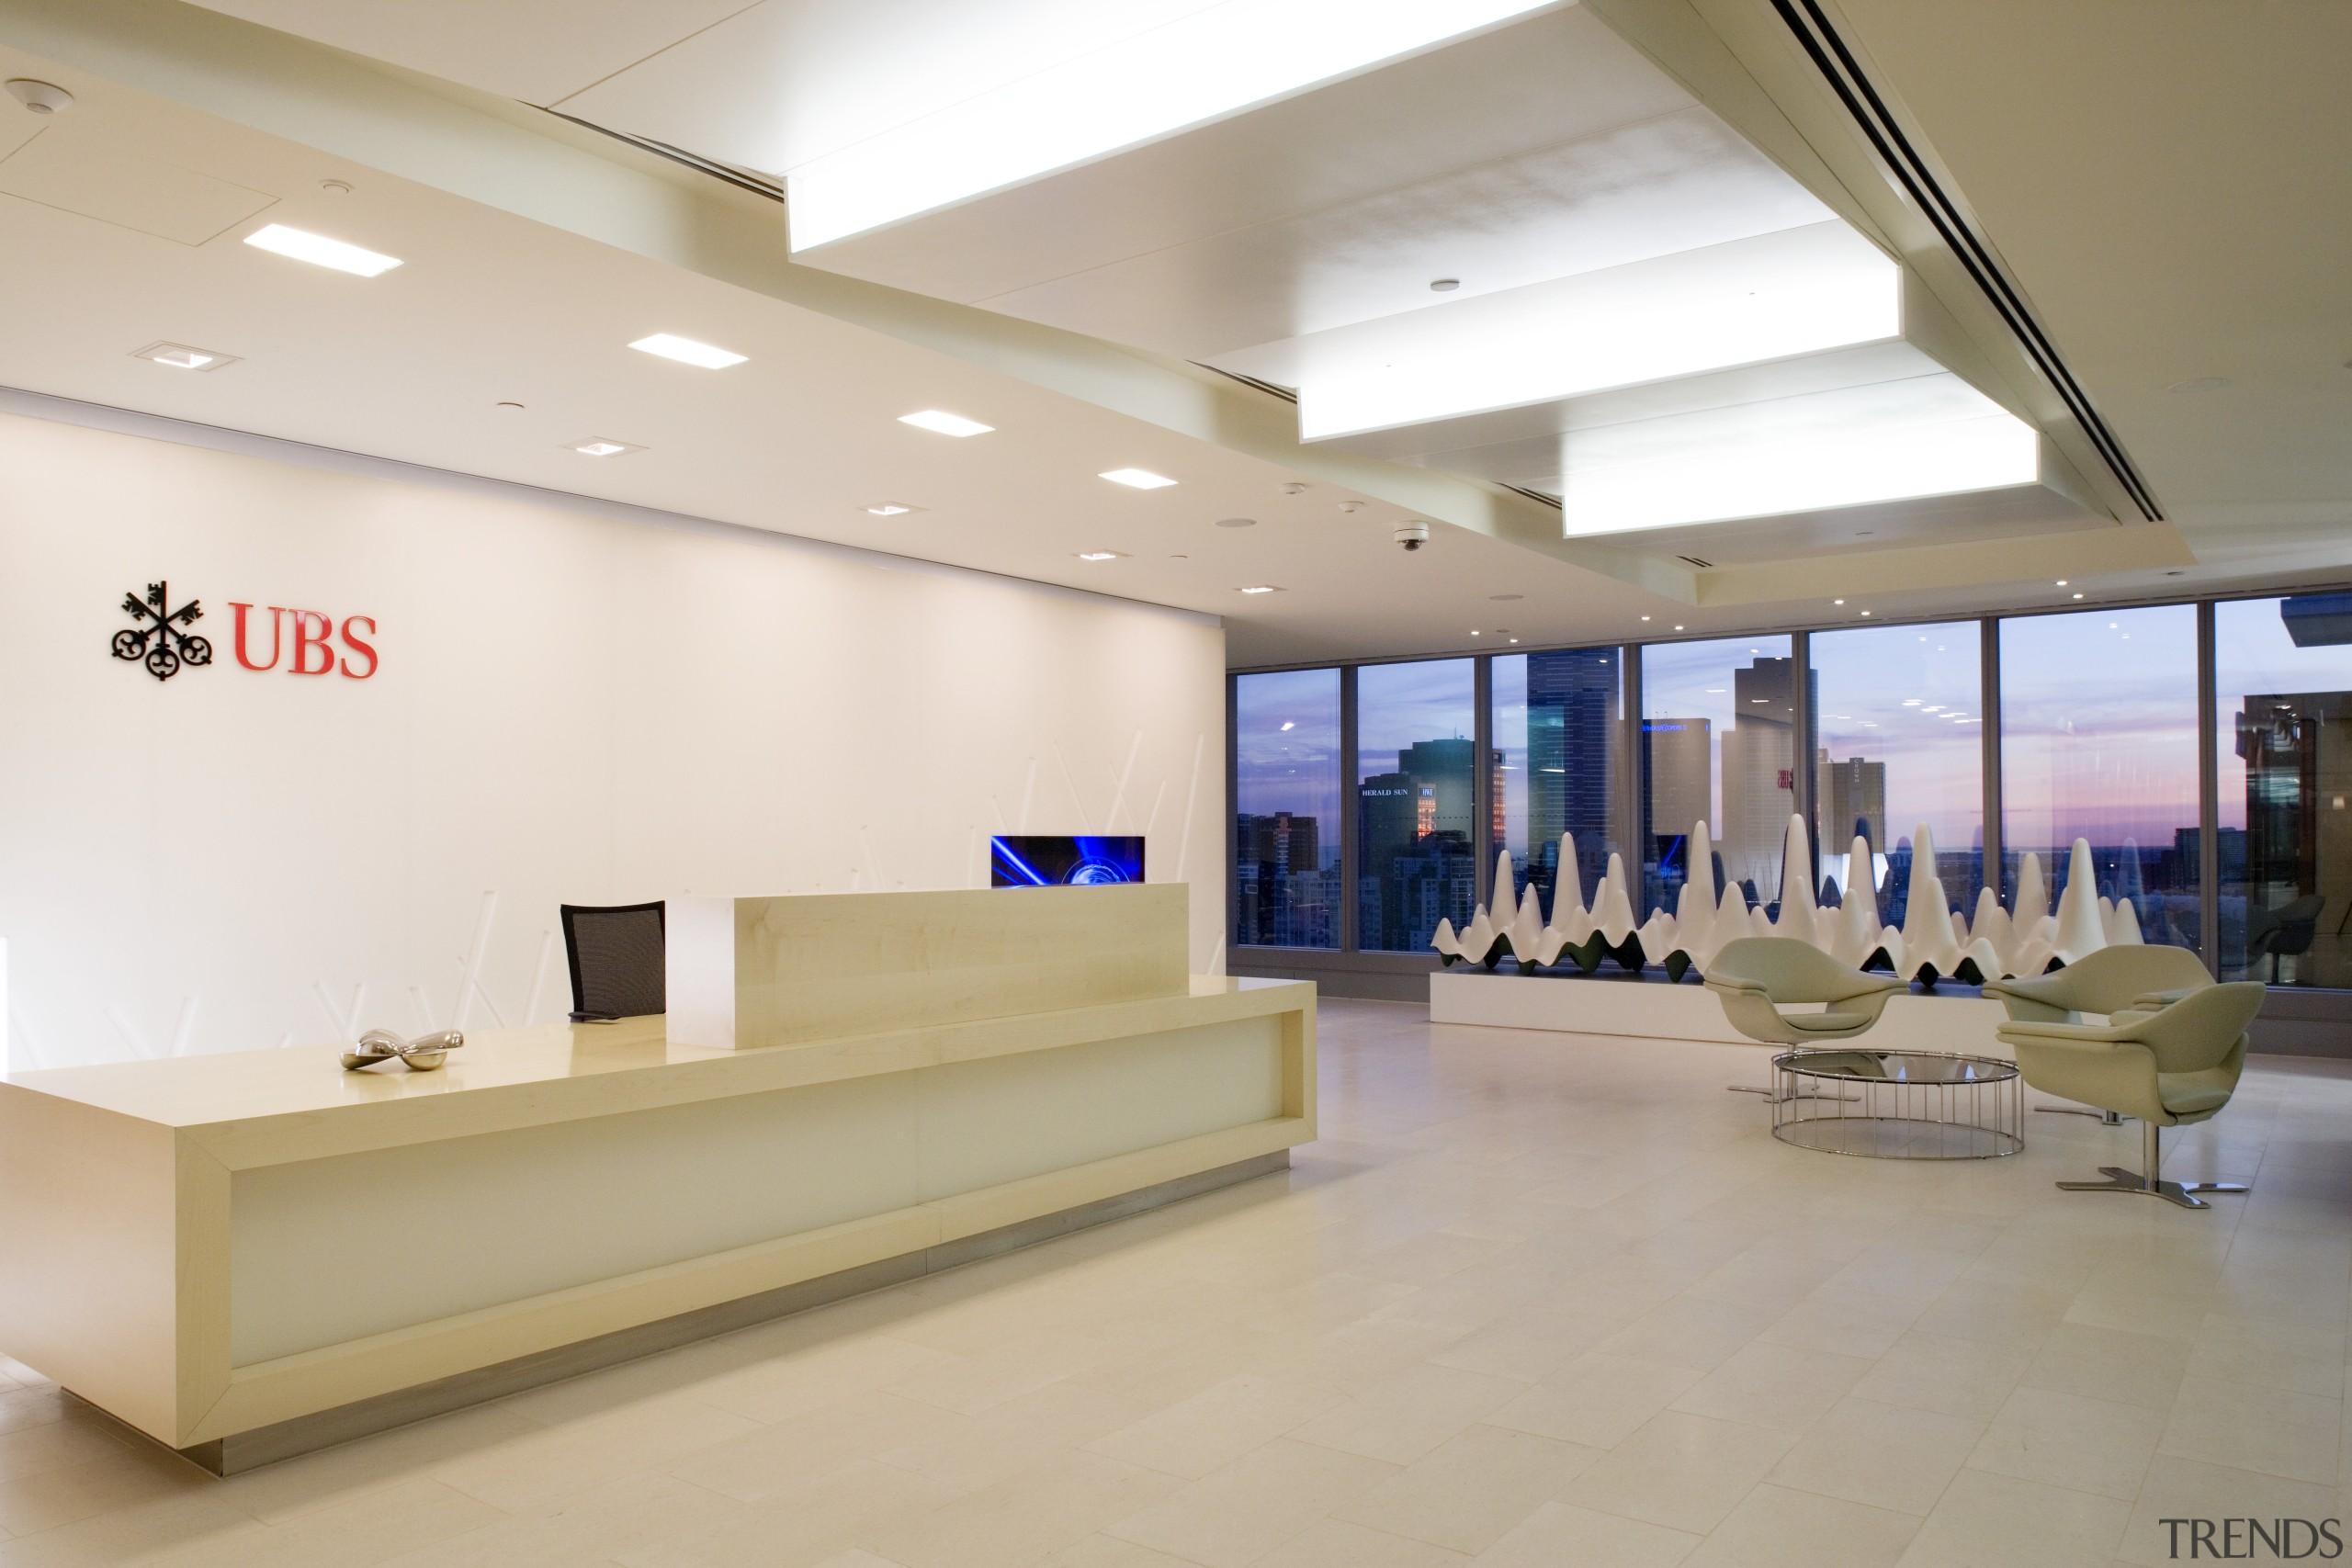 Sculptrural artwork and furniture help define the recption ceiling, exhibition, floor, flooring, interior design, lobby, product design, gray